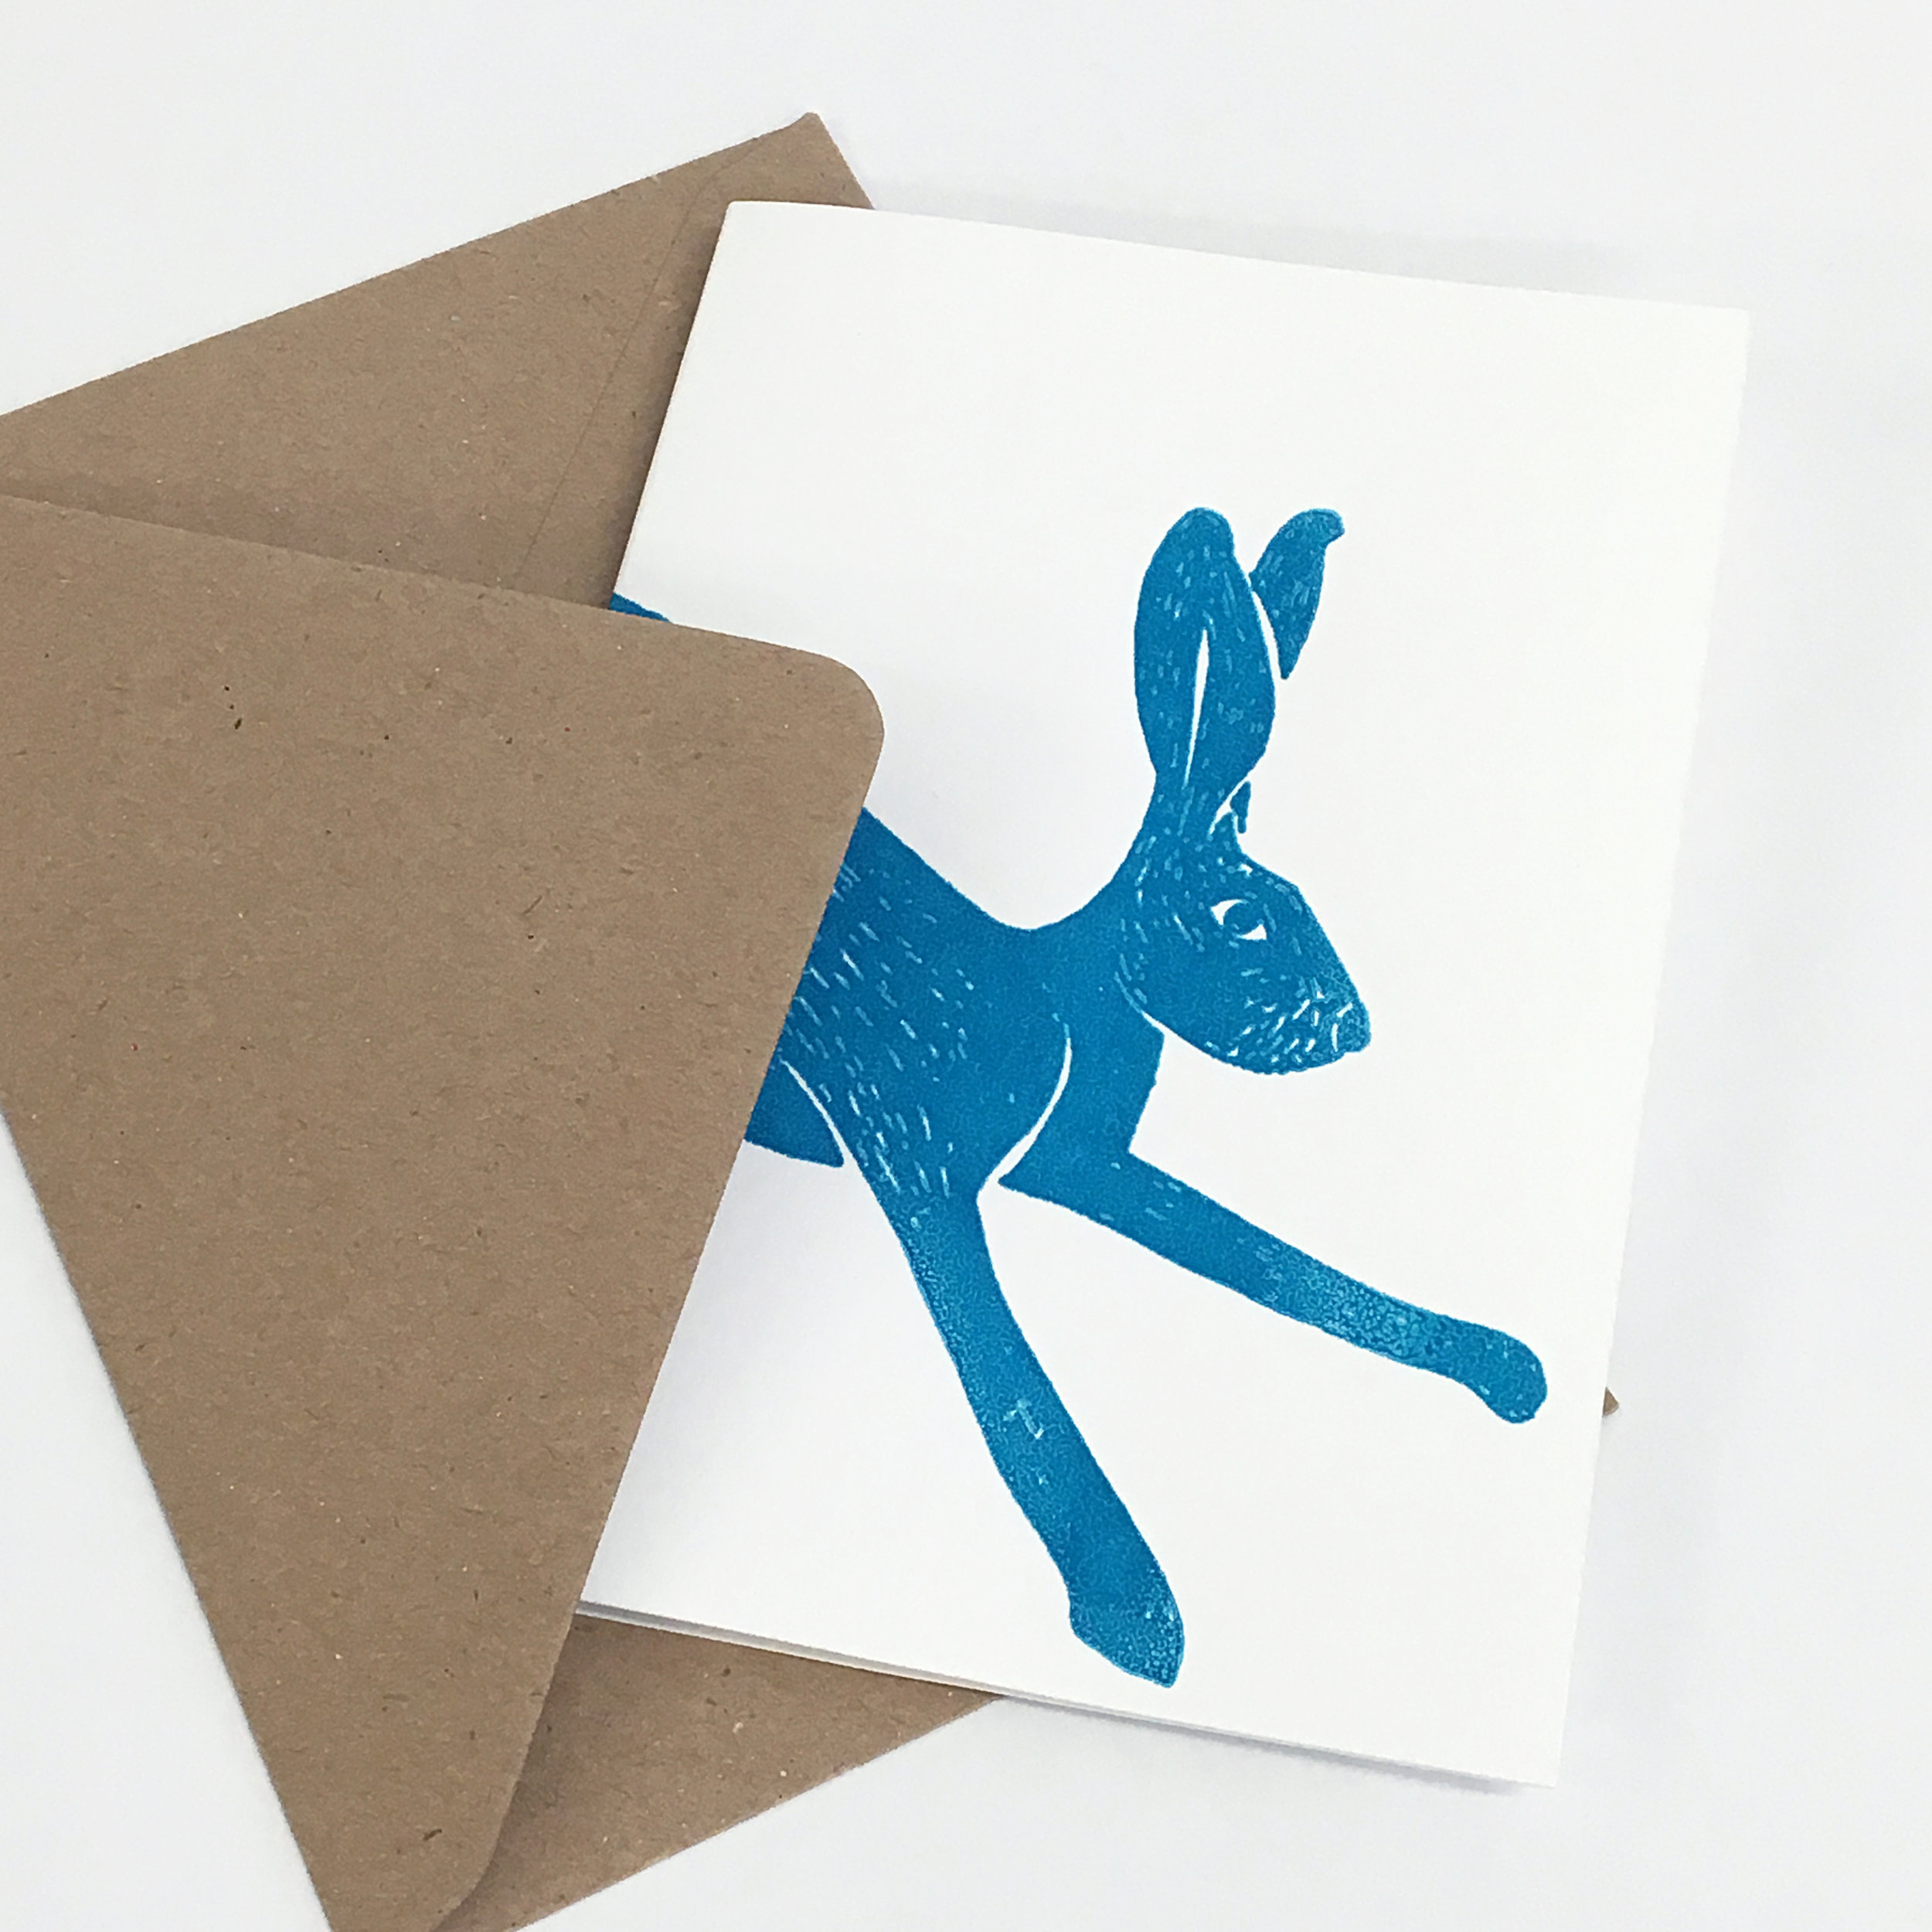 Jane Bain_Hare cards_3_silkscreen print.jpg